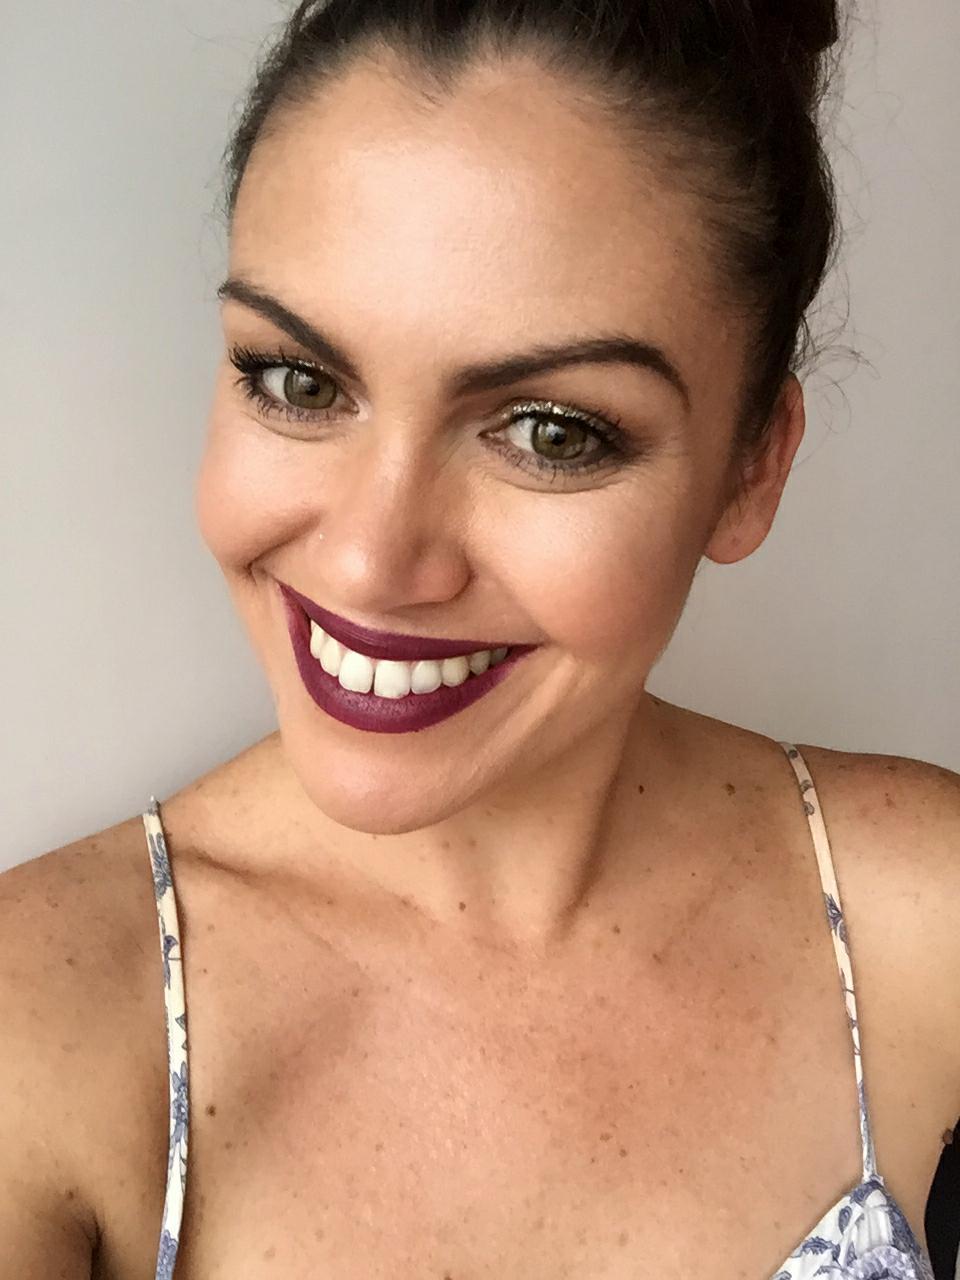 samantha clark smile white teeth arbonne lipstick plum